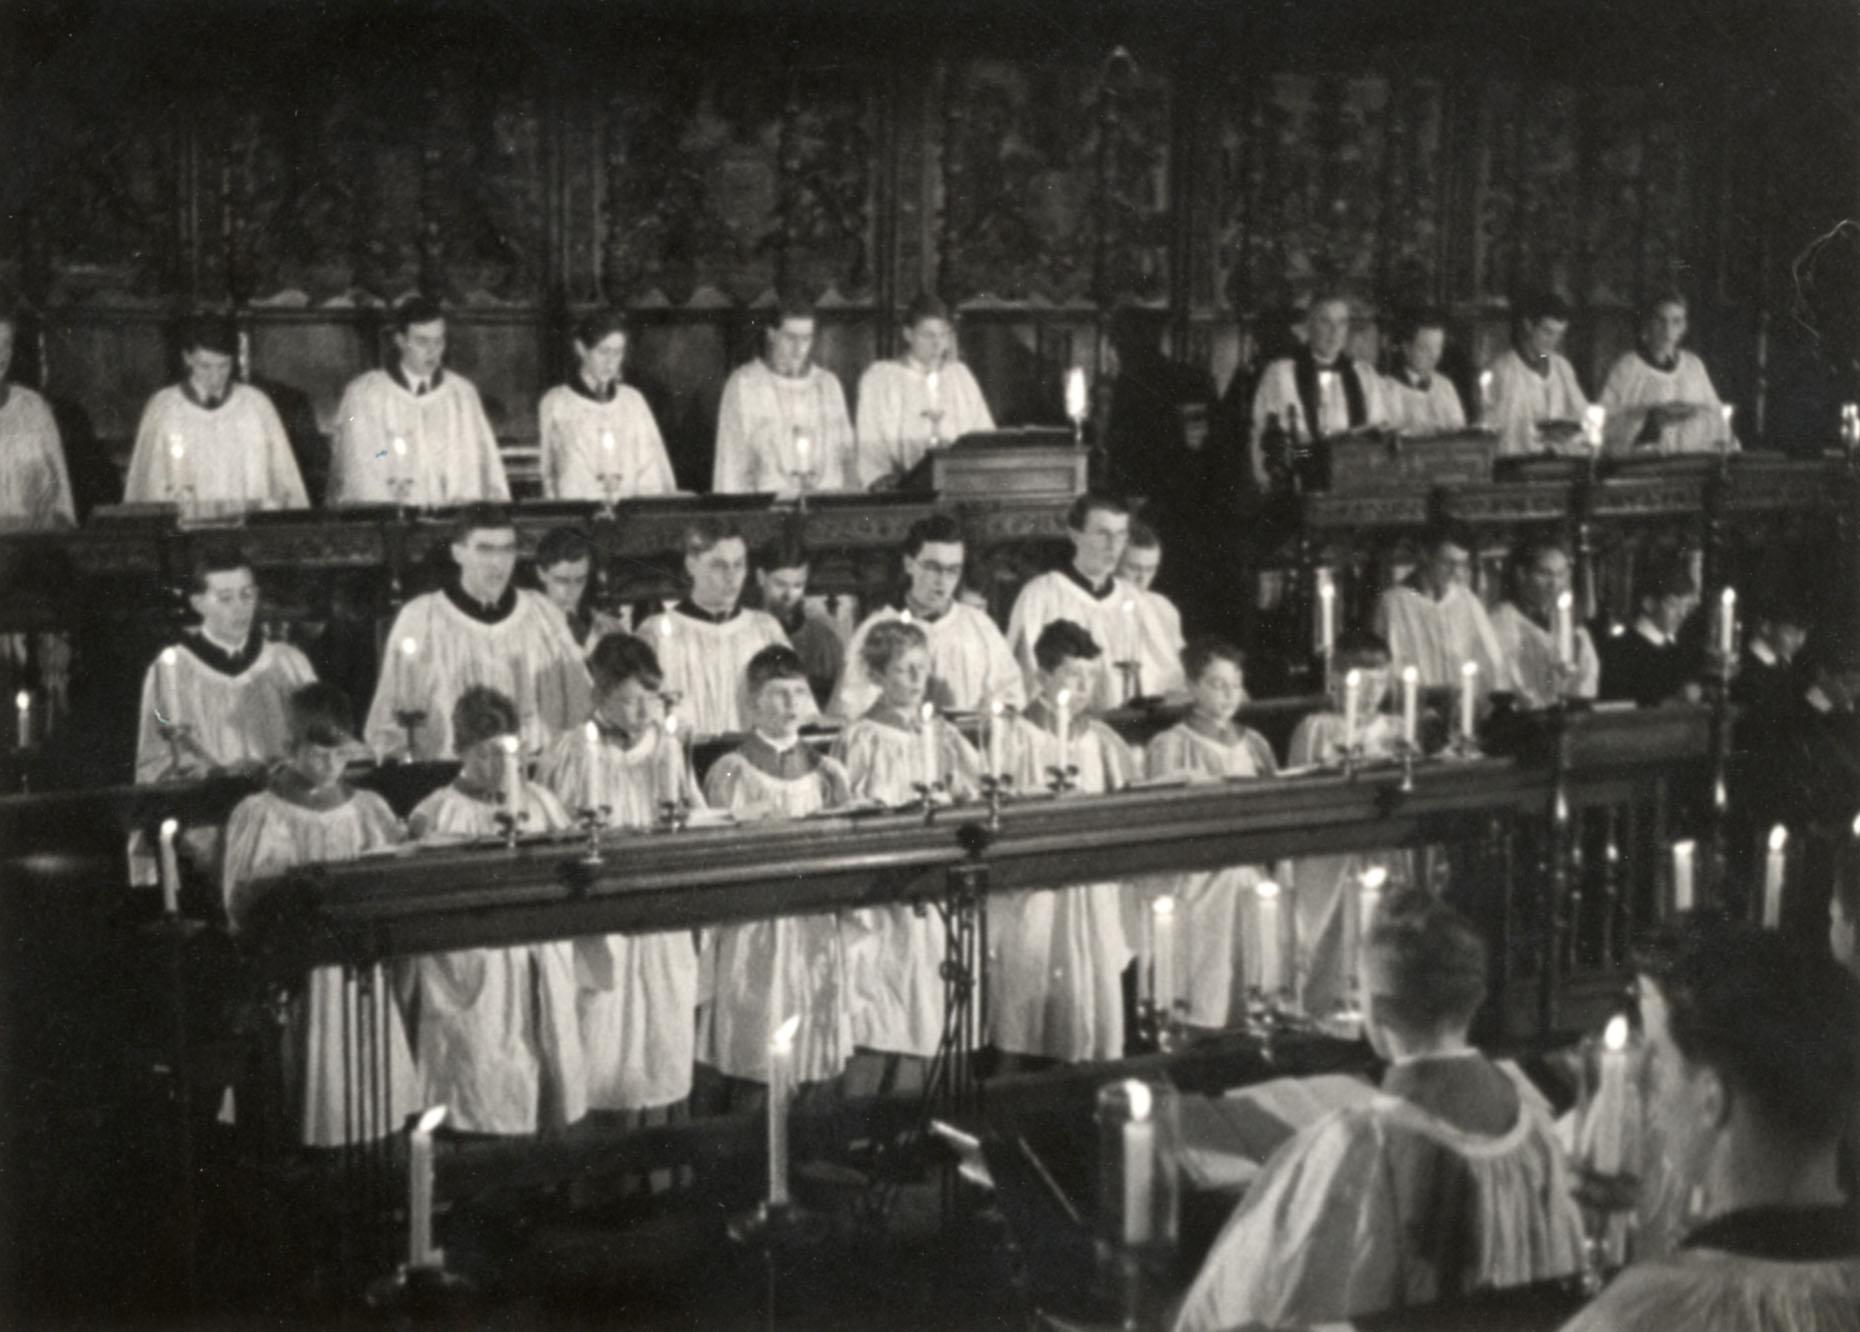 Still of choristers singing, taken from 'Christmas Under Fire', November 1940. (KCPH/2/16/2)